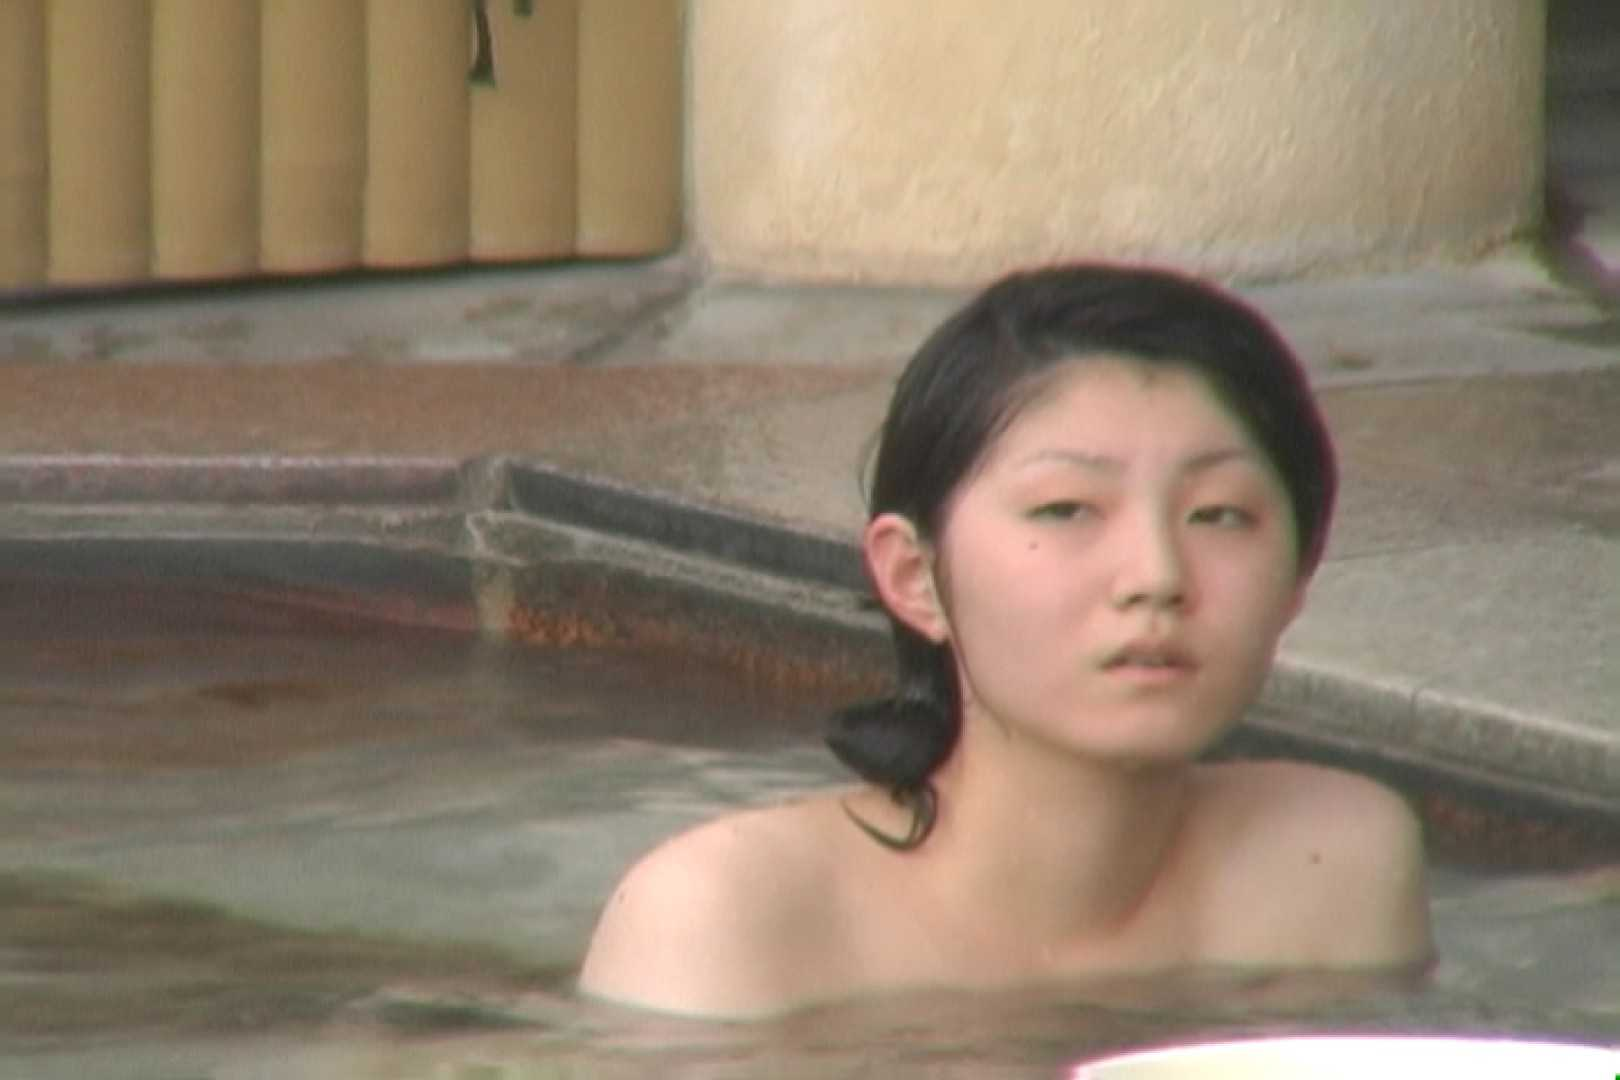 Aquaな露天風呂Vol.579 盗撮 | HなOL  53pic 20